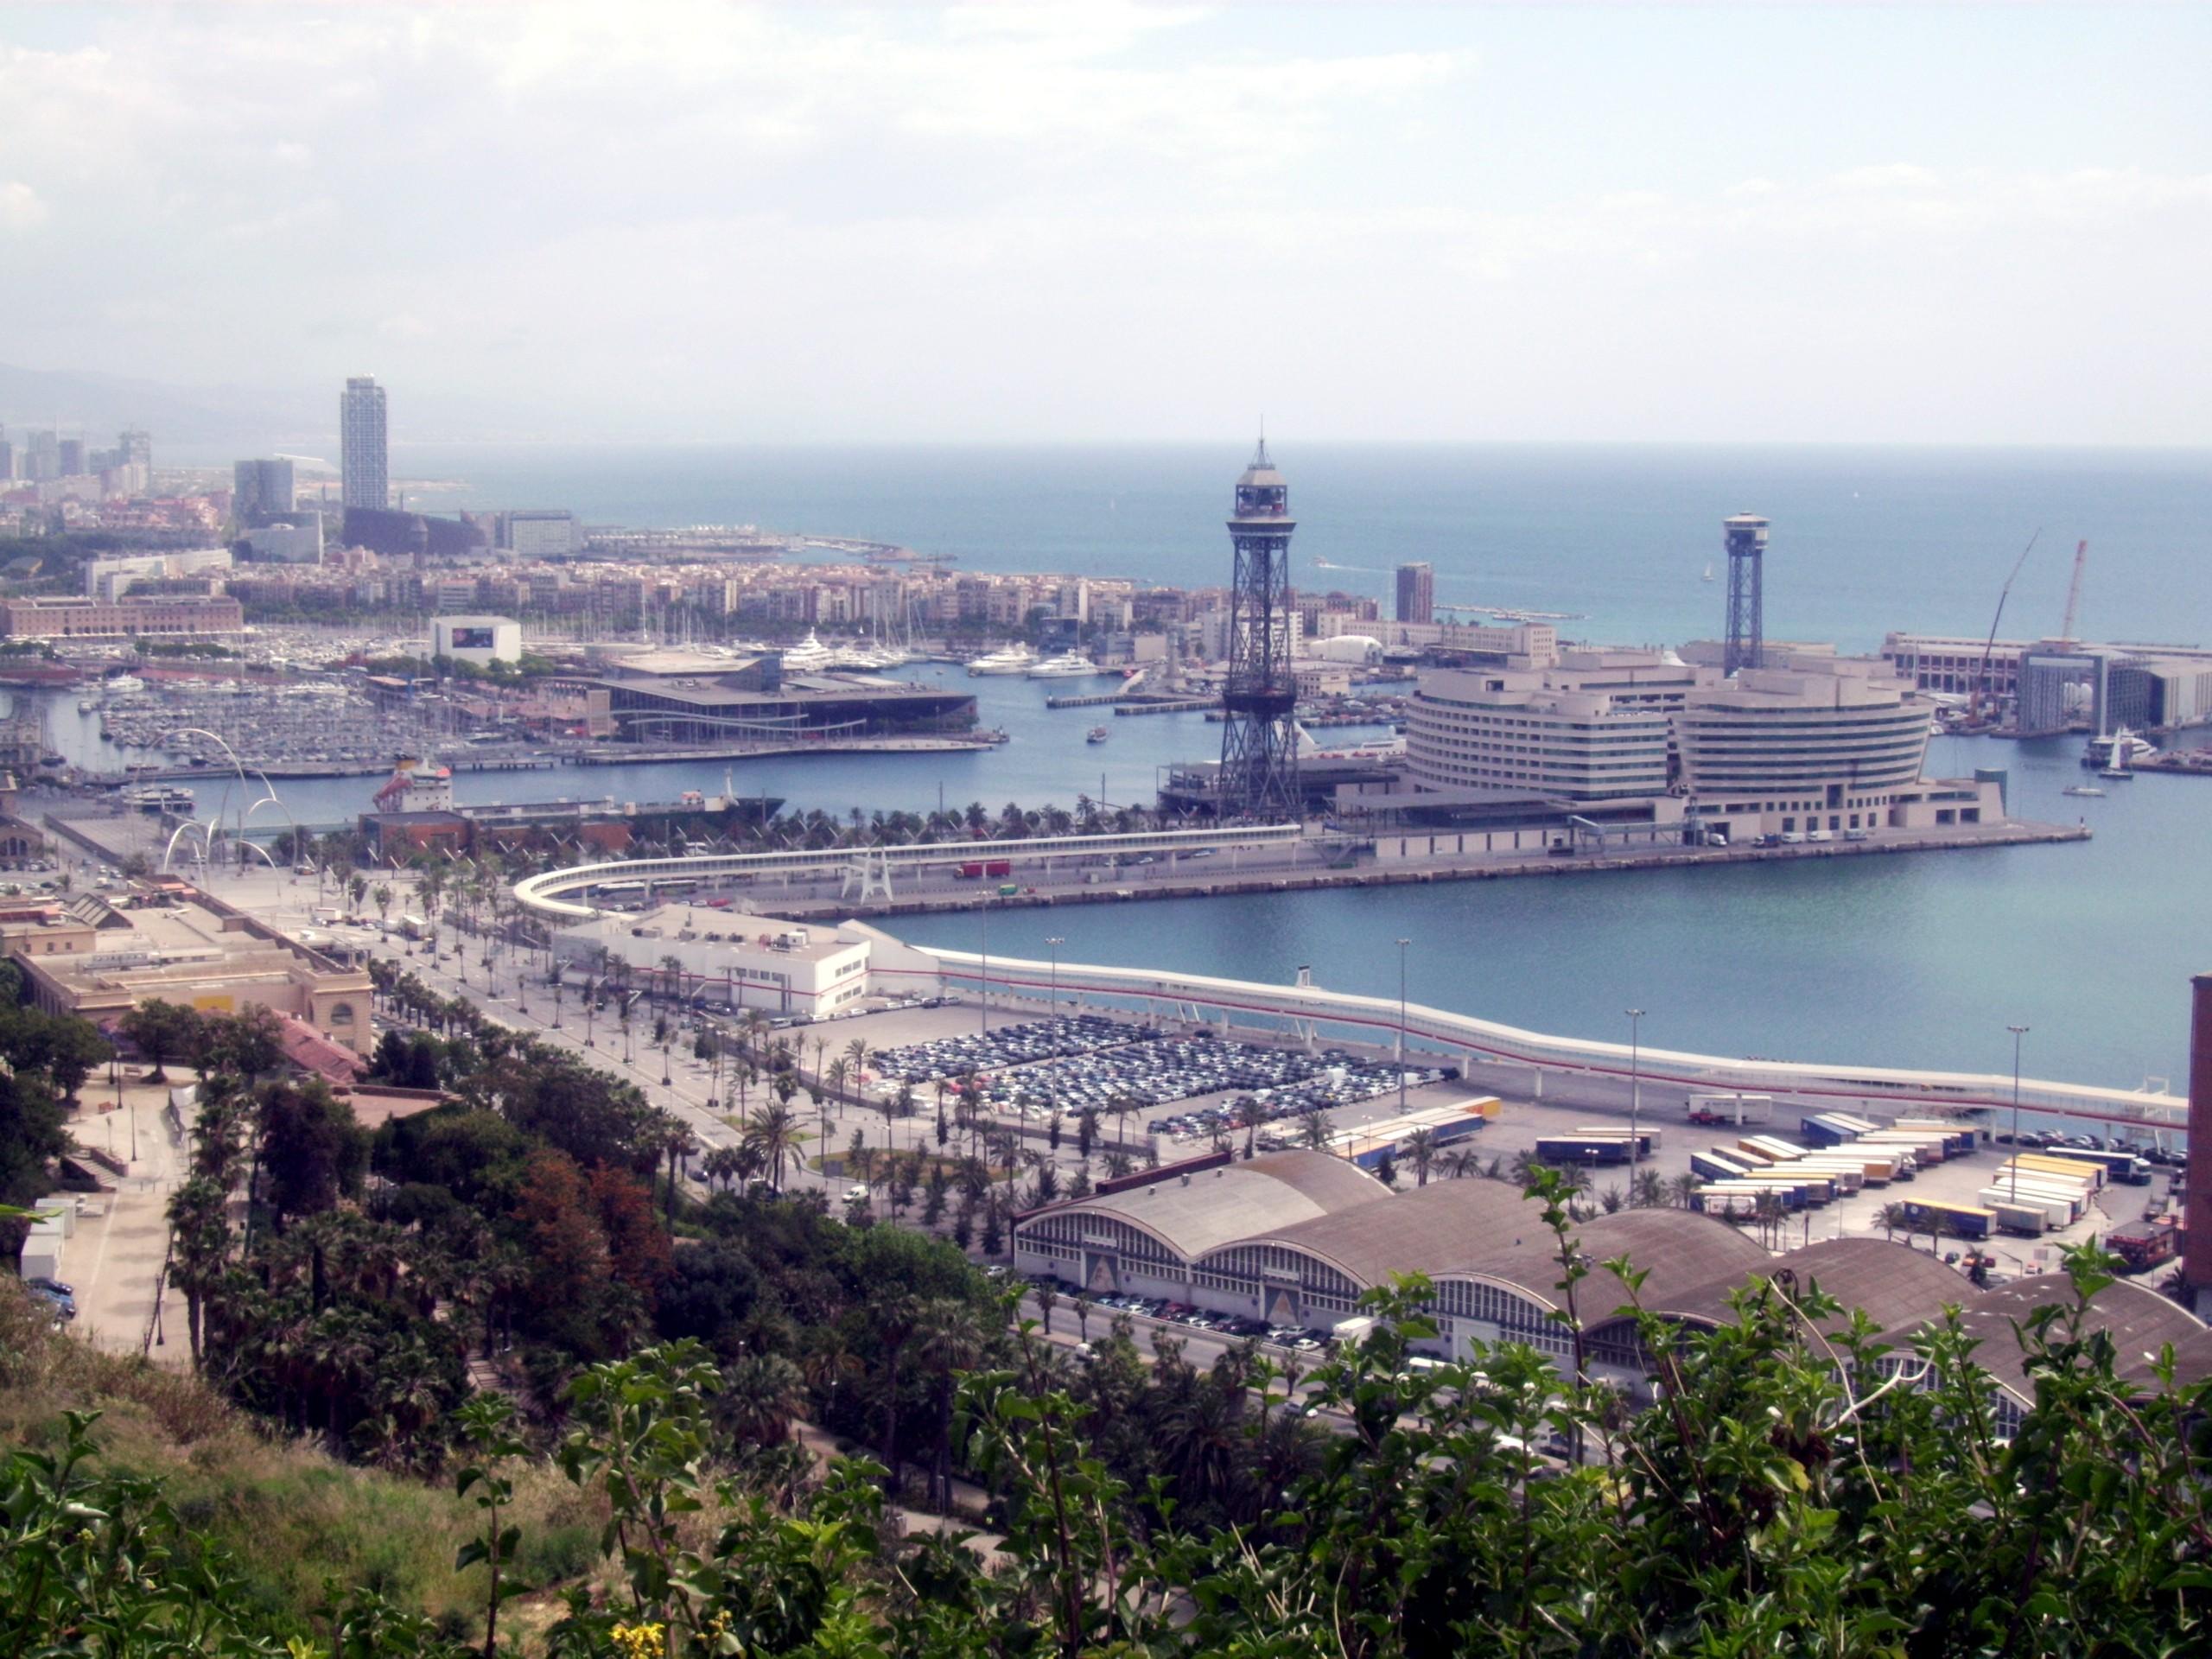 barcelona_hafen.jpg - 969,22 kB